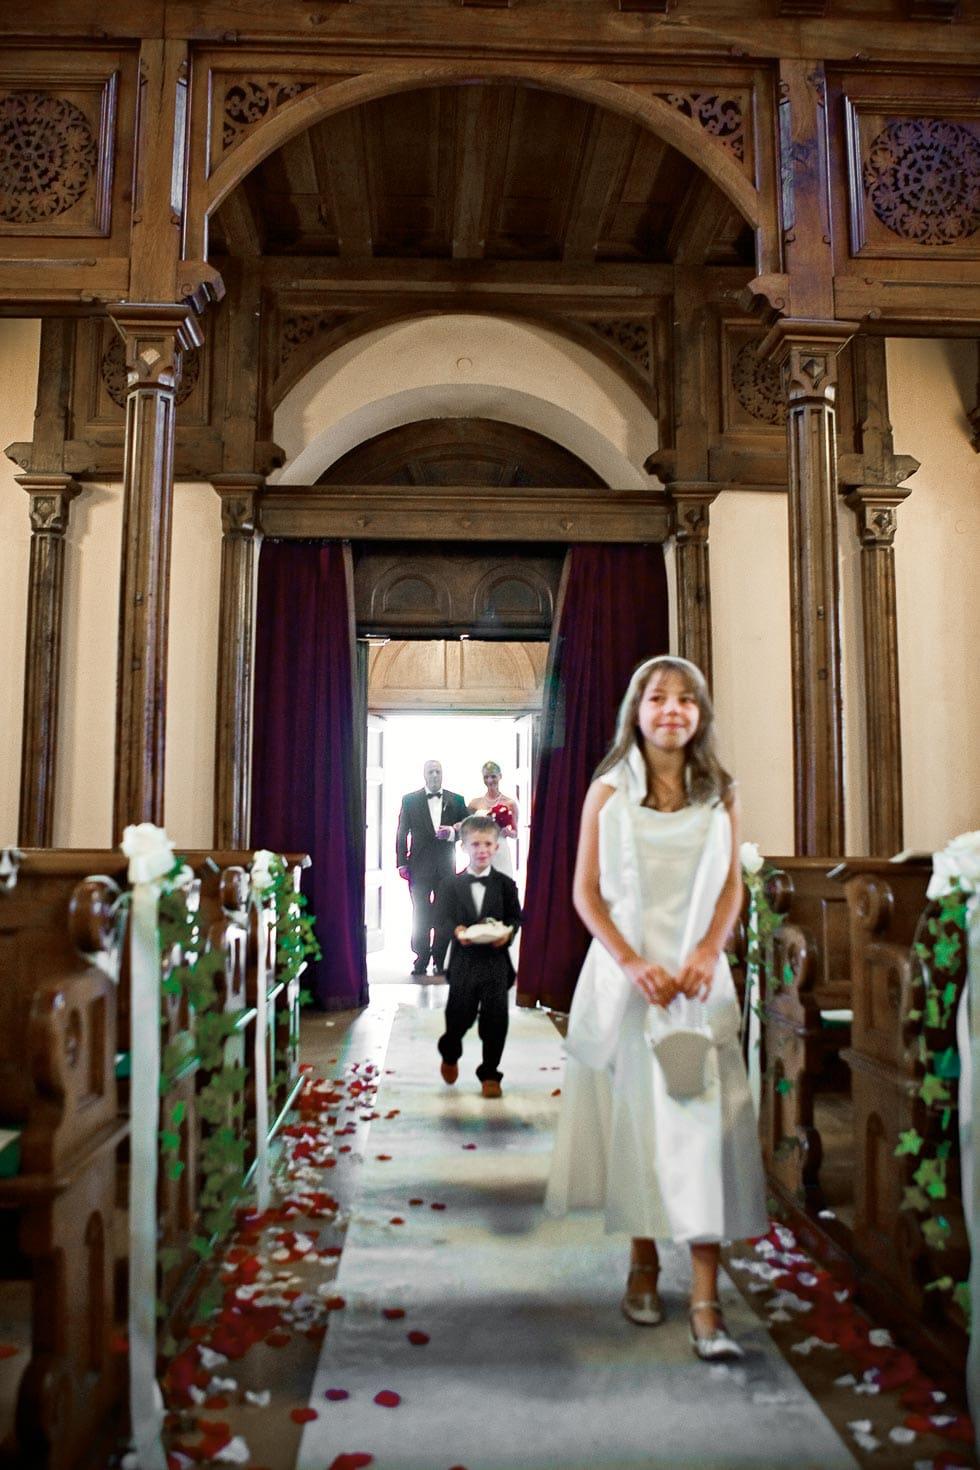 Hochzeitsdeko Kirche 65 zauberhafte KirchendekoIdeen